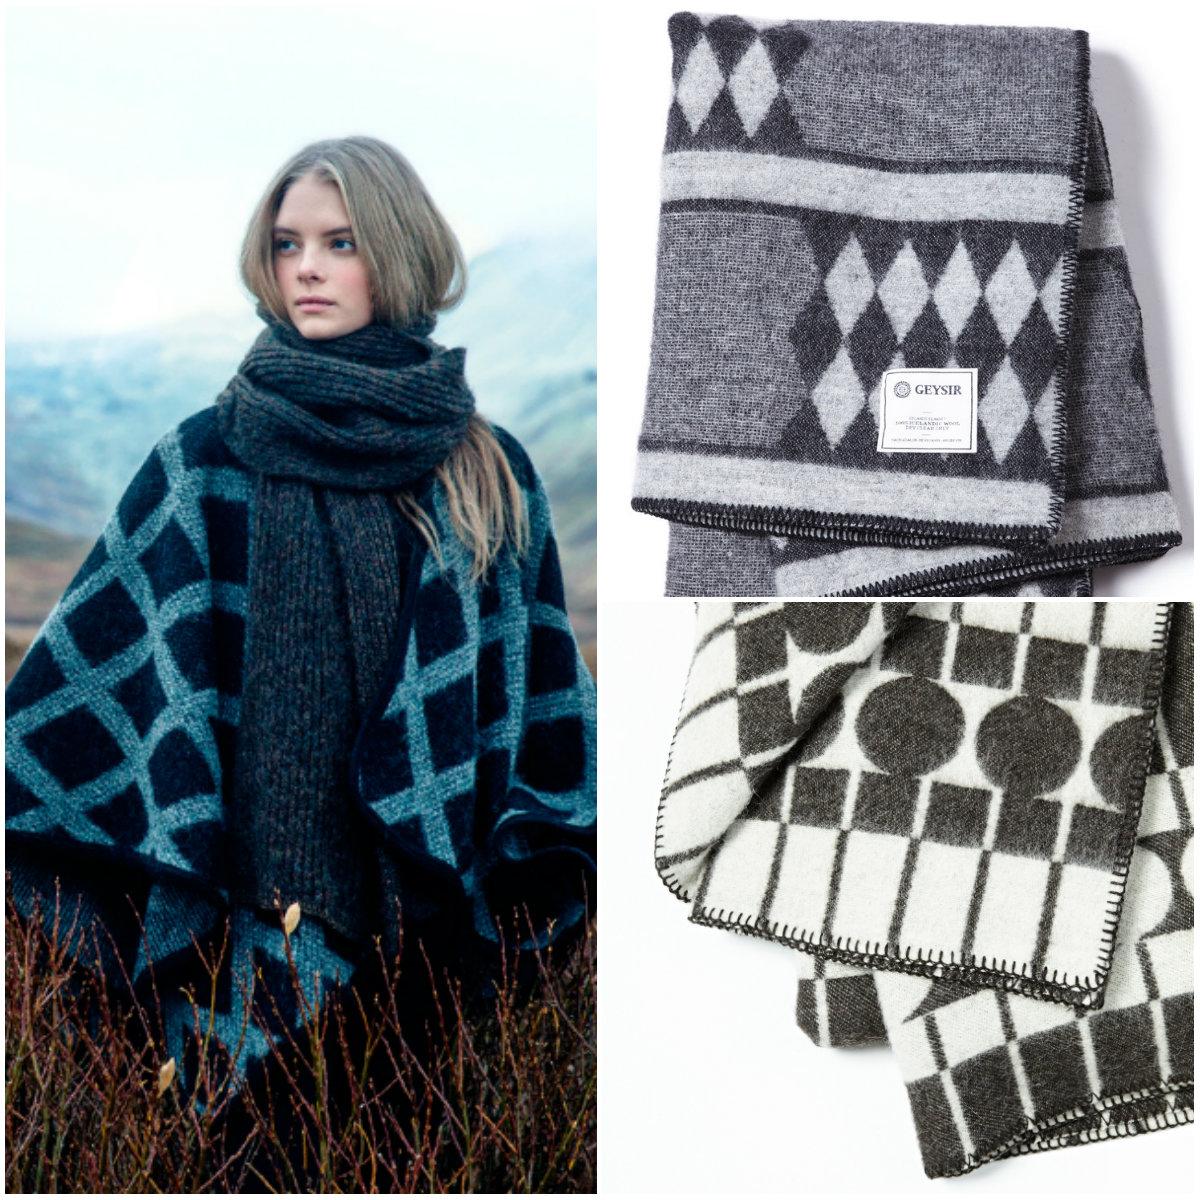 Geysir-Wool-Blanket